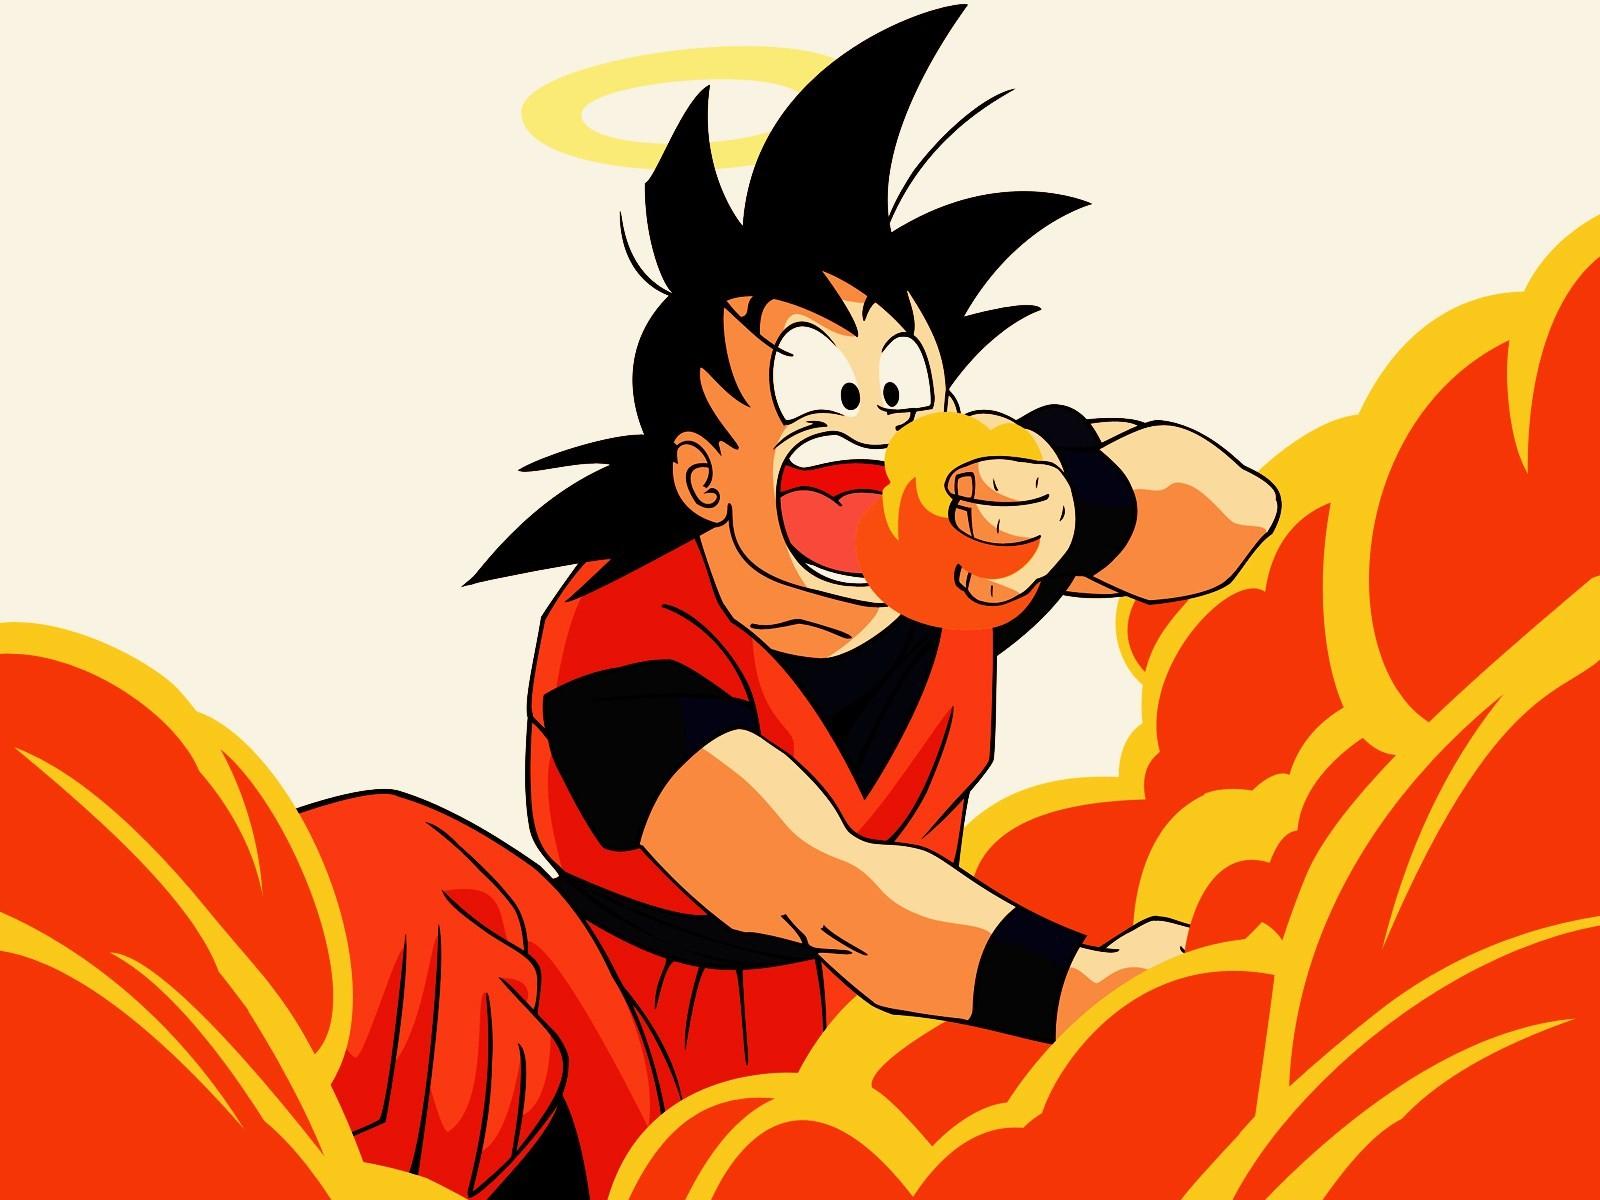 Wallpaper ilustrasi anime gambar kartun bola naga son goku ilustrasi anime gambar kartun bola naga son goku dragon ball z komik buku komik altavistaventures Images